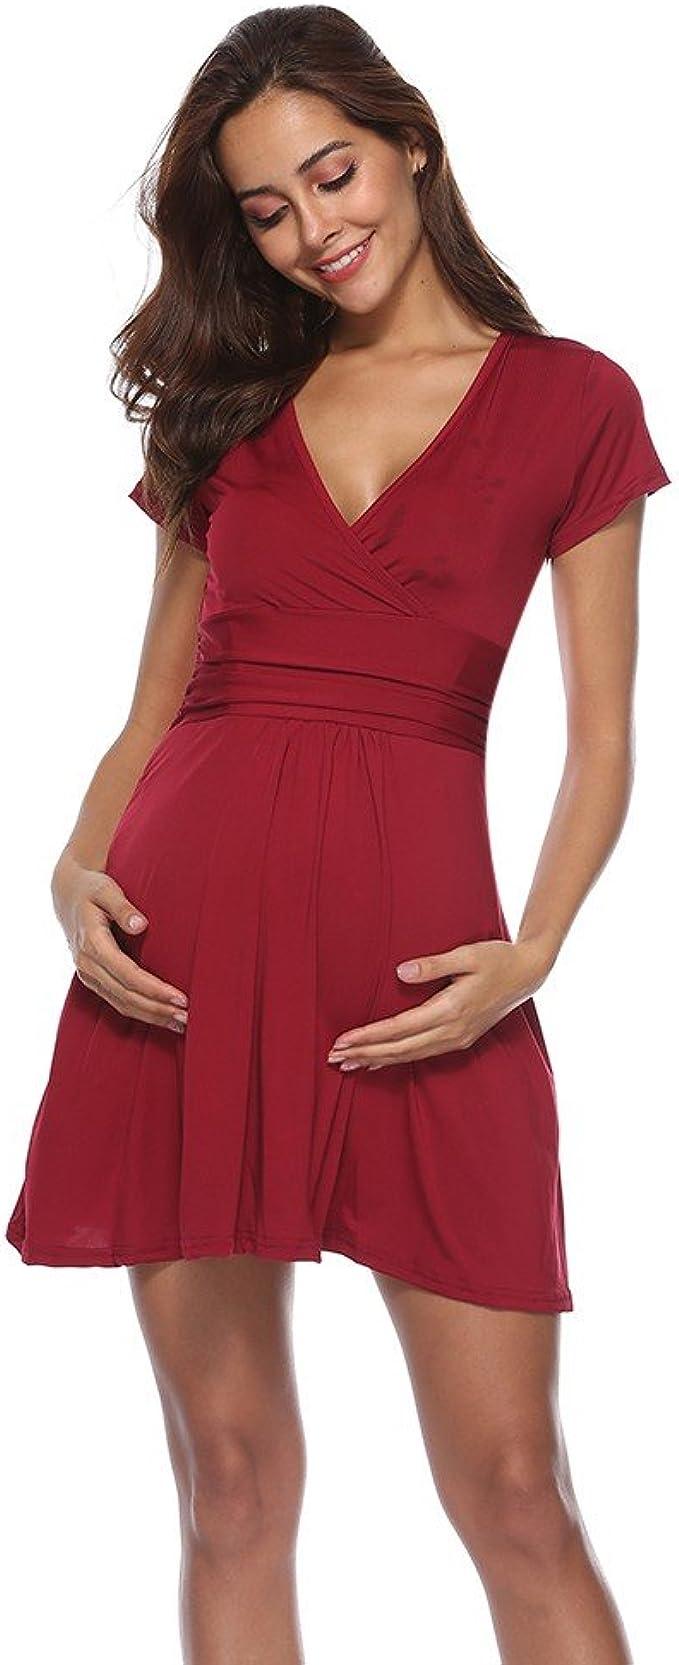 iLPM18 Frauen Mutterschaft Kurzarm Bequeme Pflege Nachthemd Stillen